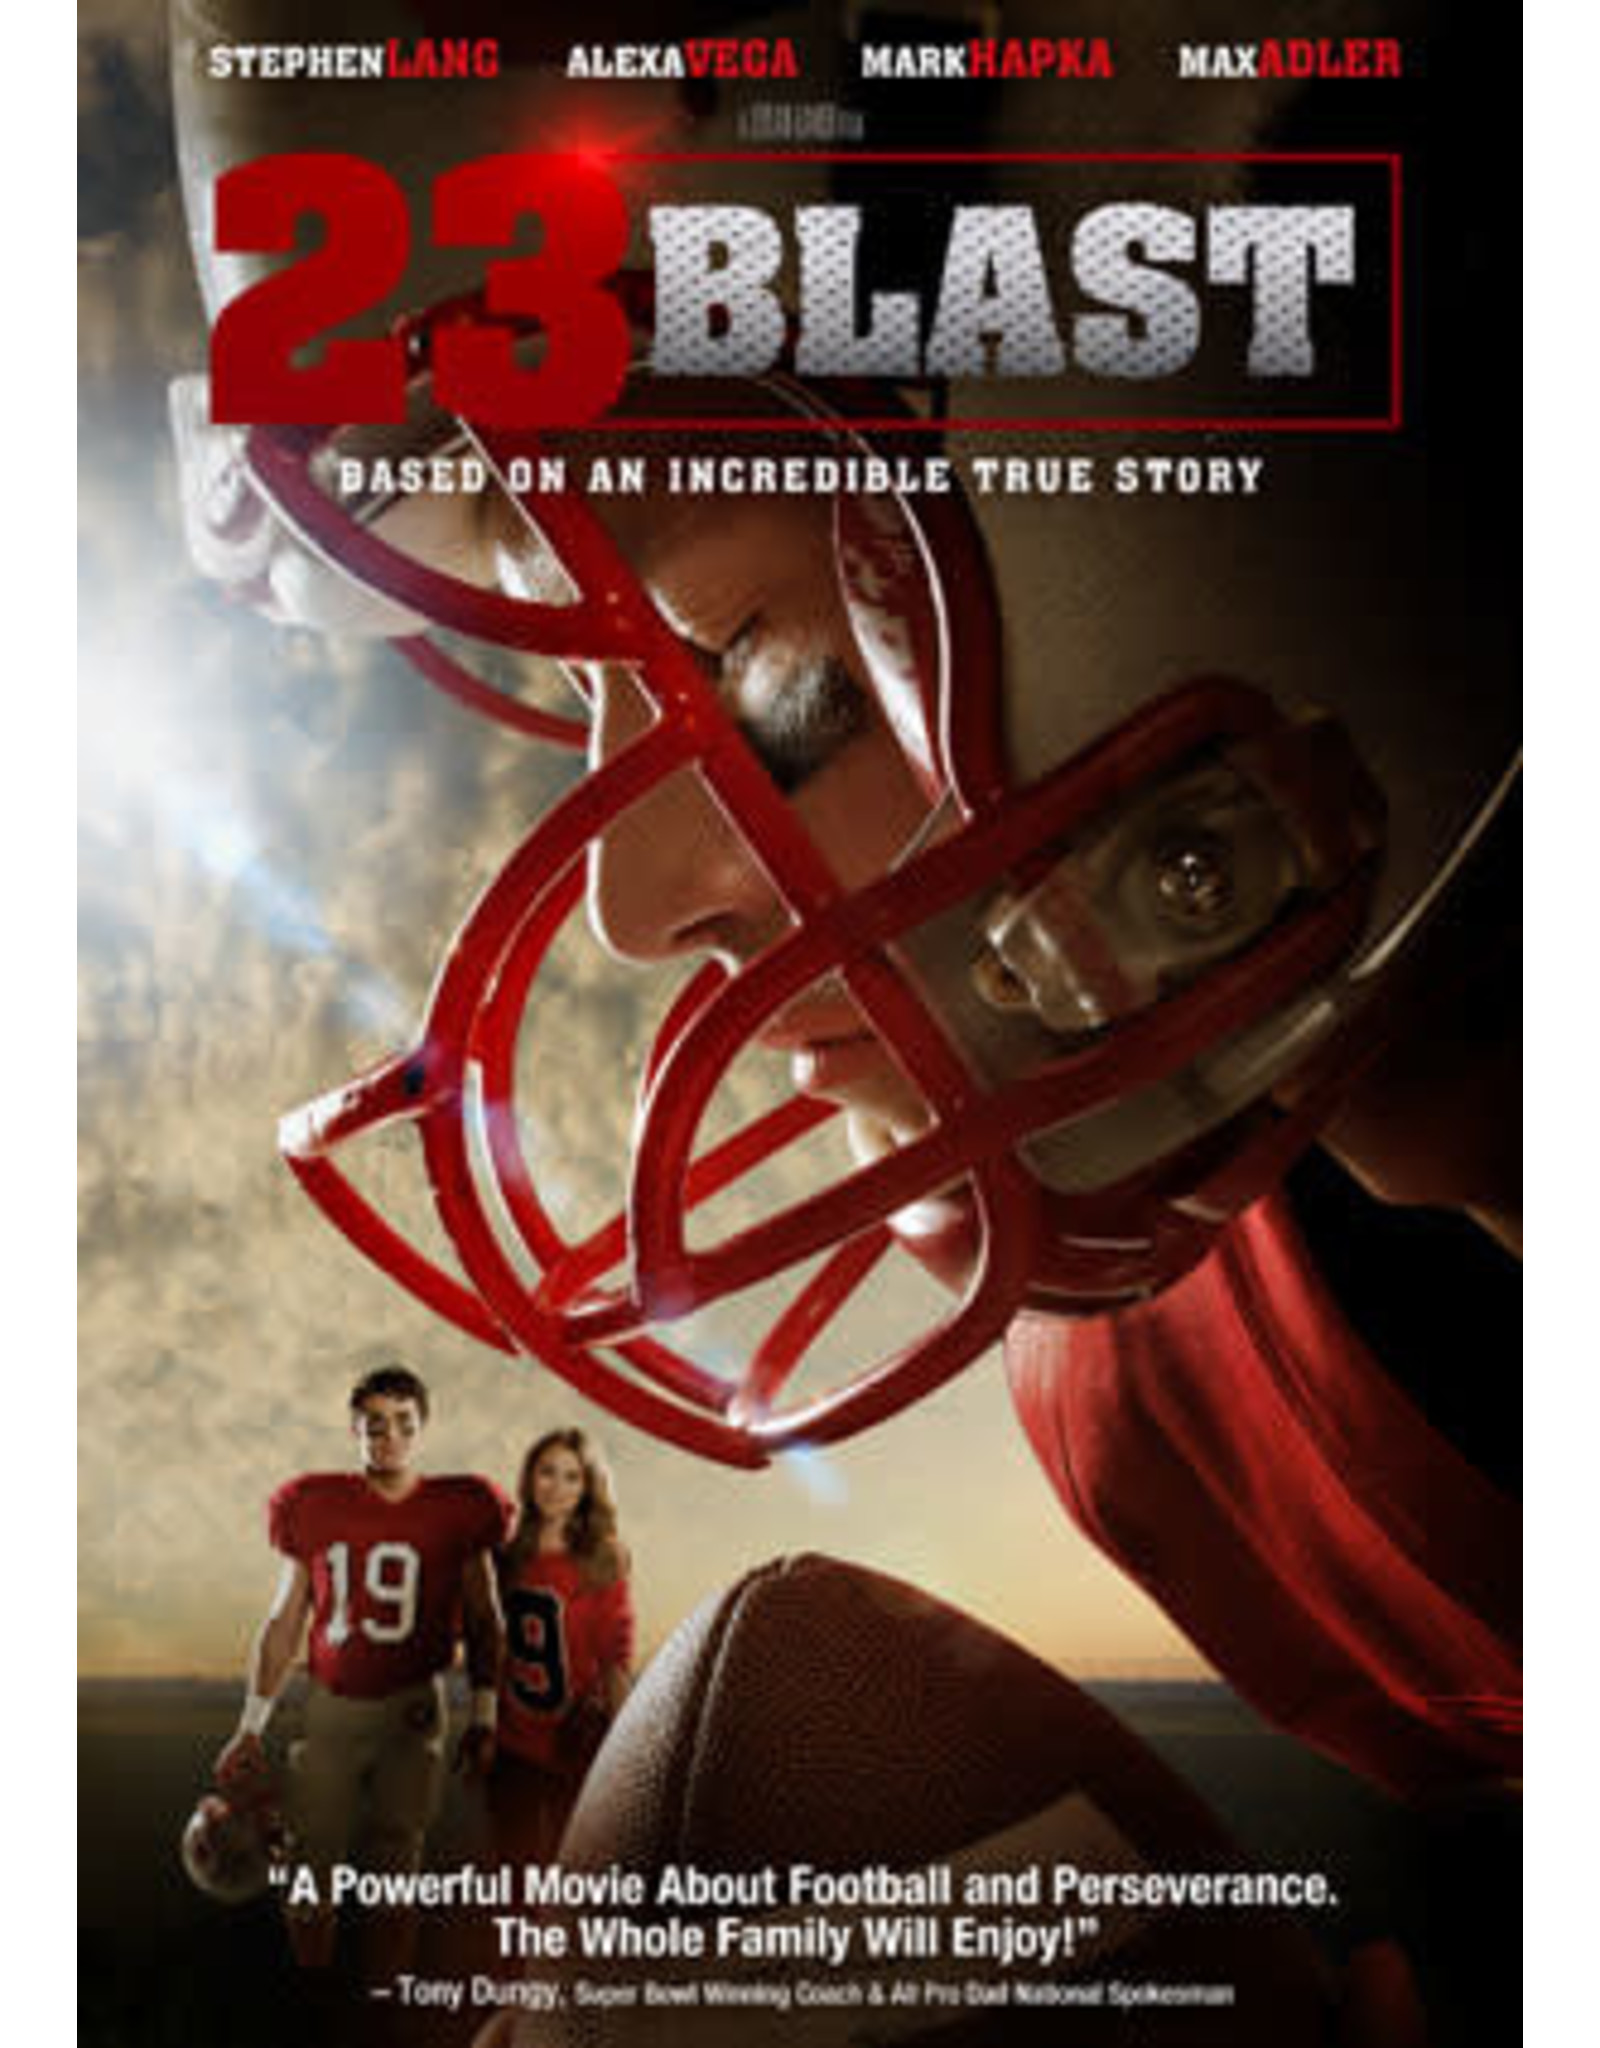 Ocean Avenue Entertainment 23 Blast (CBA Version)